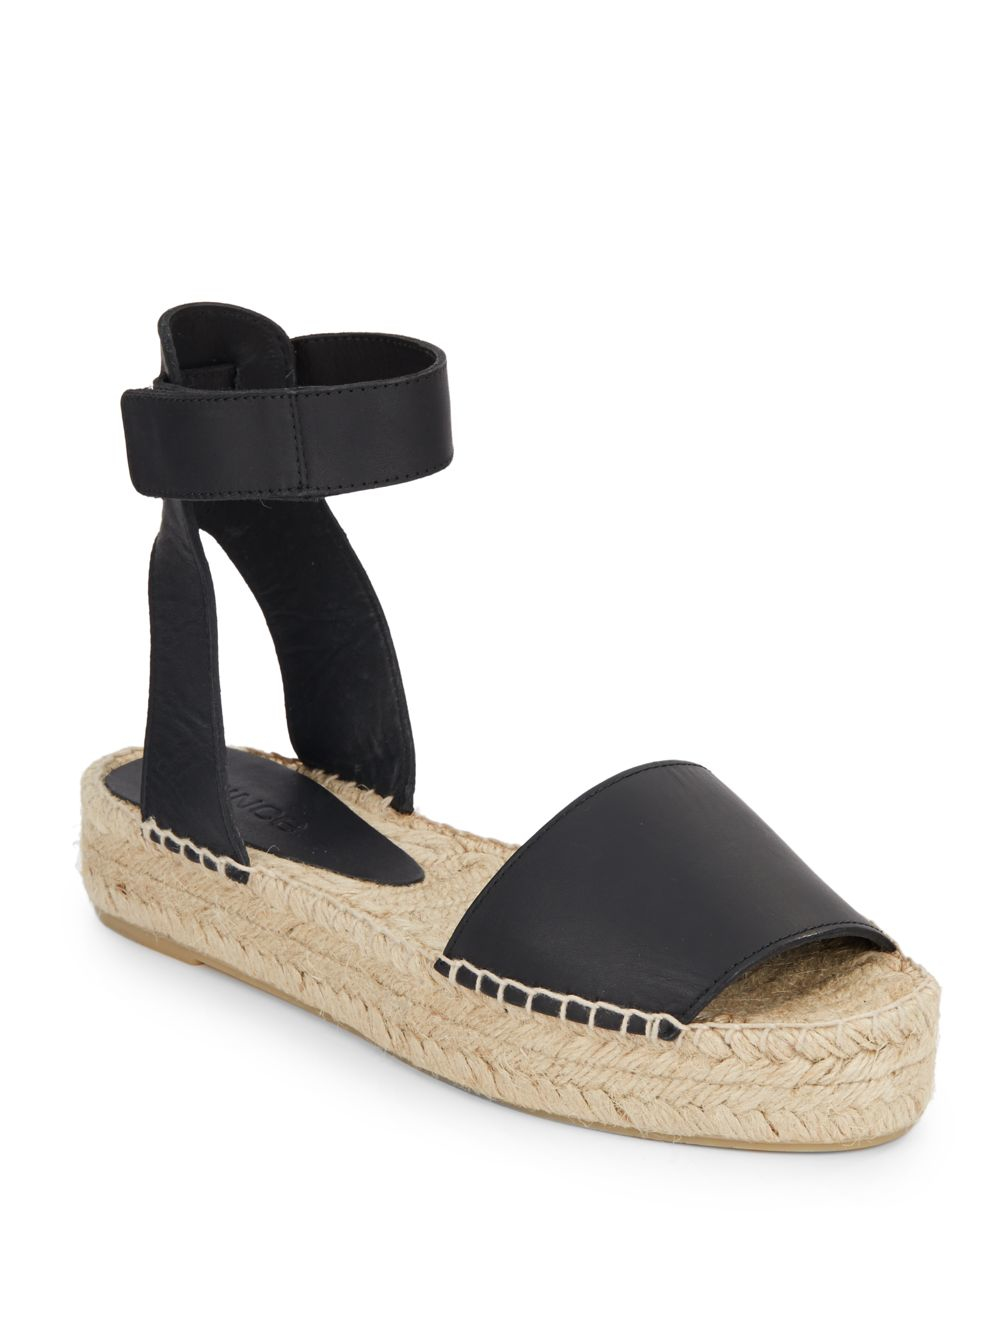 Lyst Vince Edie Leather And Jute Flatform Sandals In Black